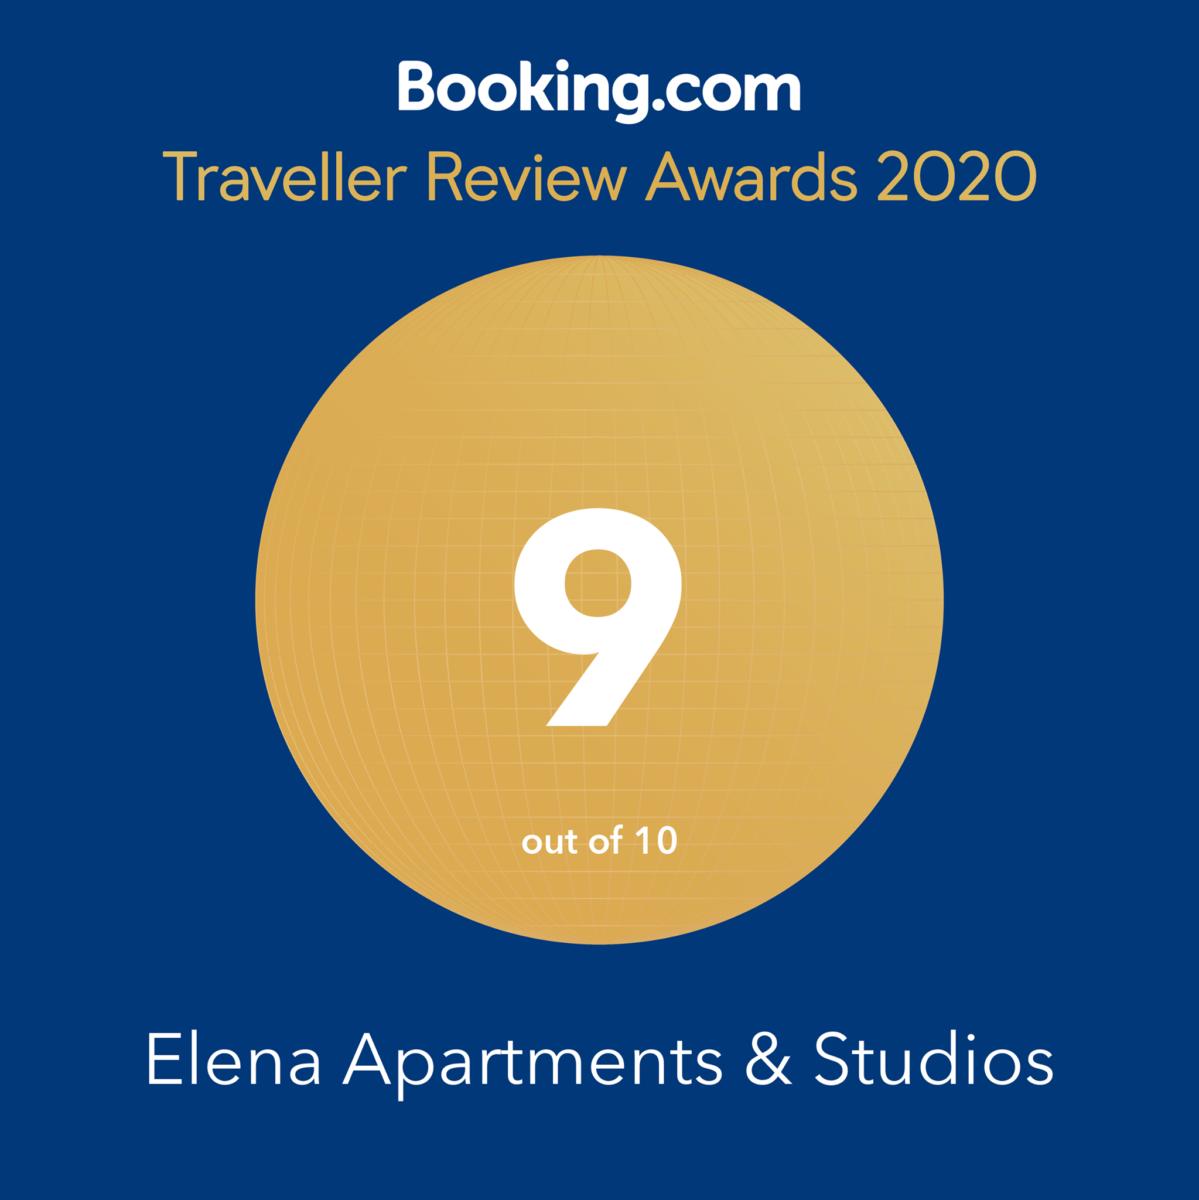 Booking Traveller Review Award 2020